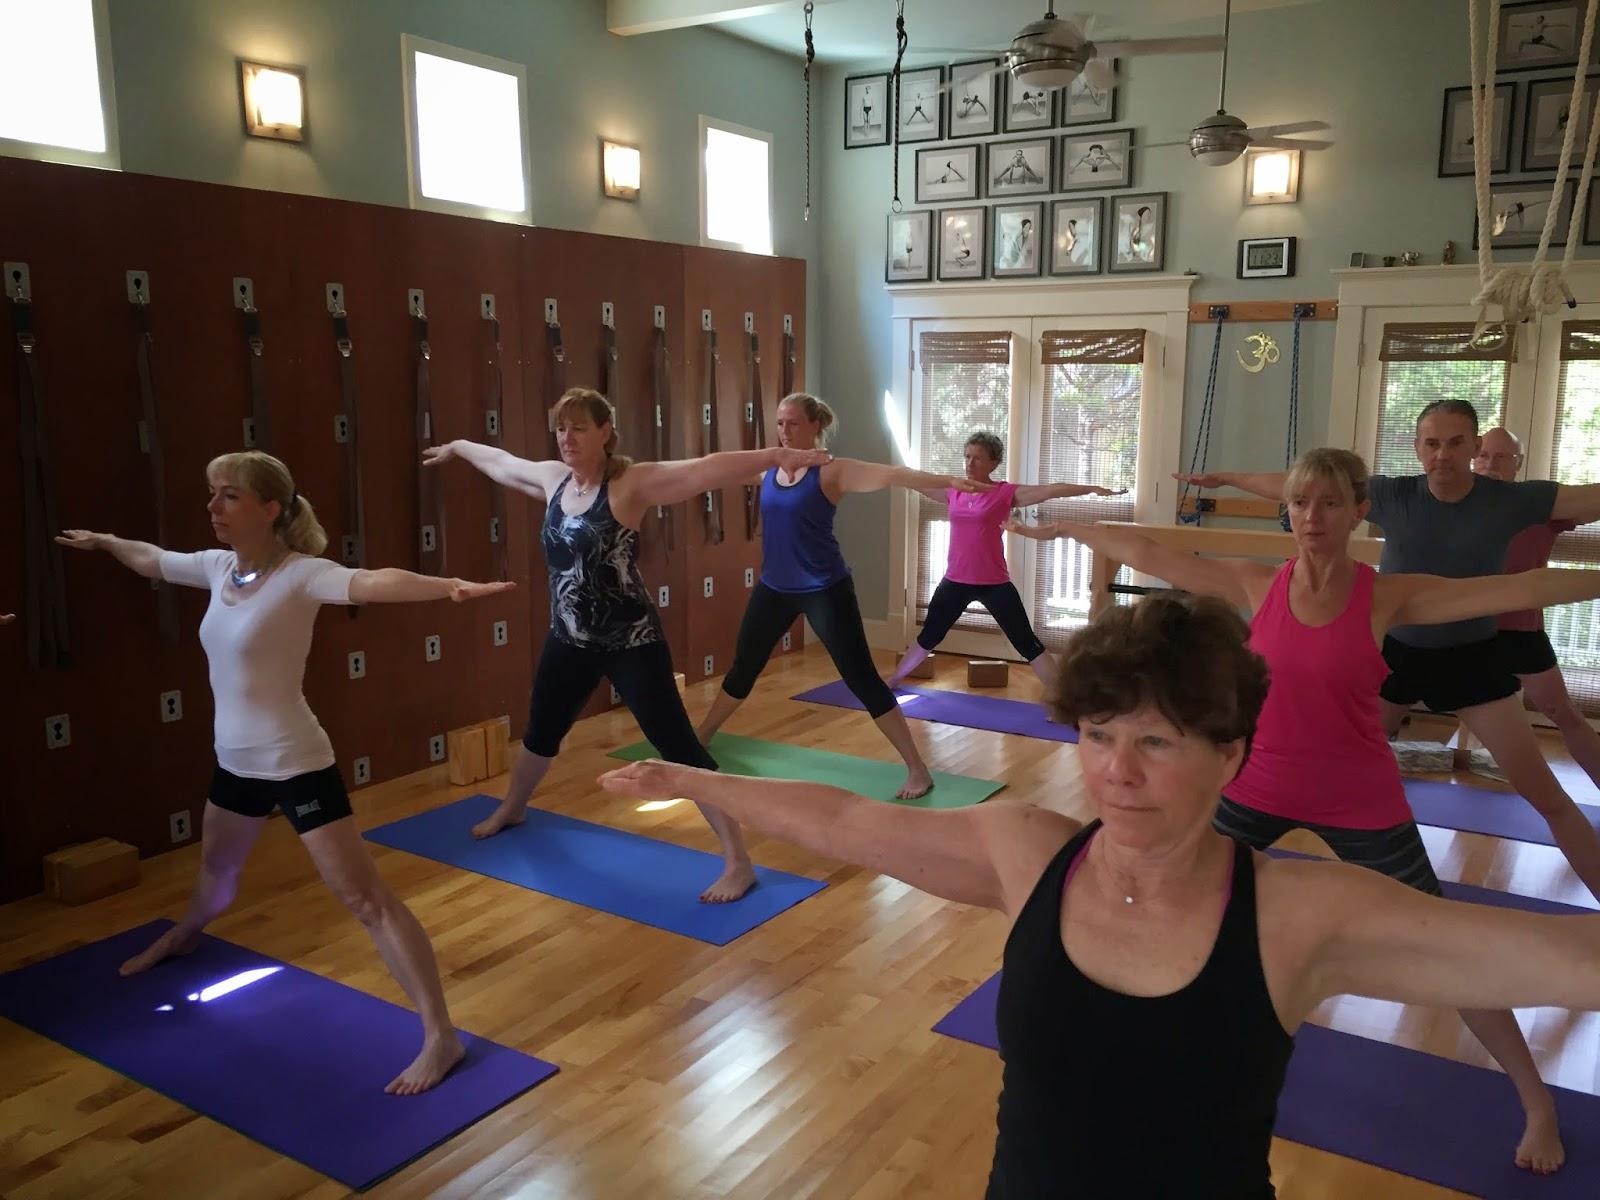 Iyengar Yoga In Houston Marathon Yoga Practice And Iynaus Iyascus Membership Drive